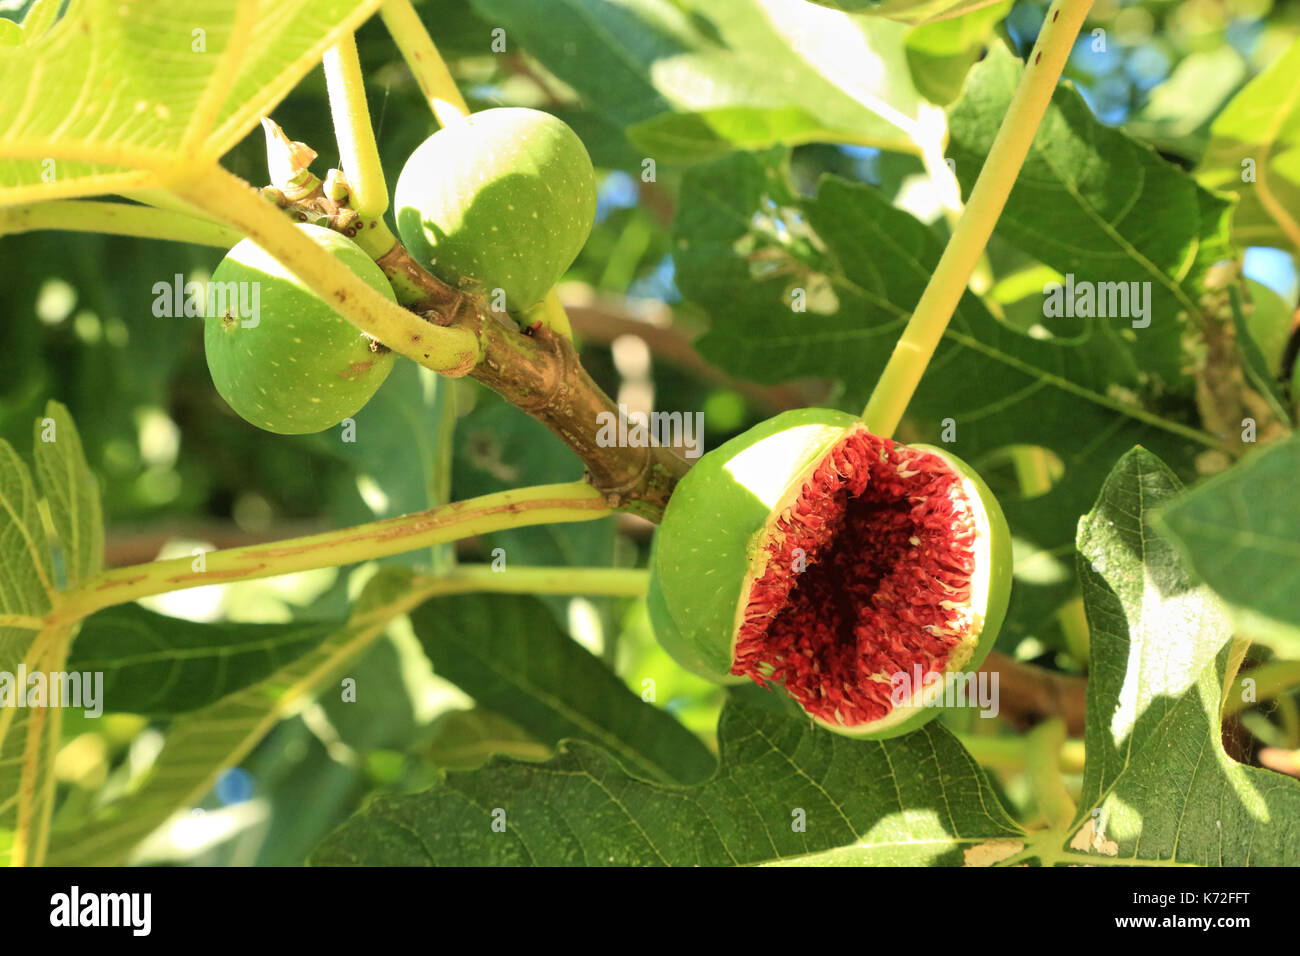 Abb. Obst in Feigenbaum Zweig öffnen Stockbild